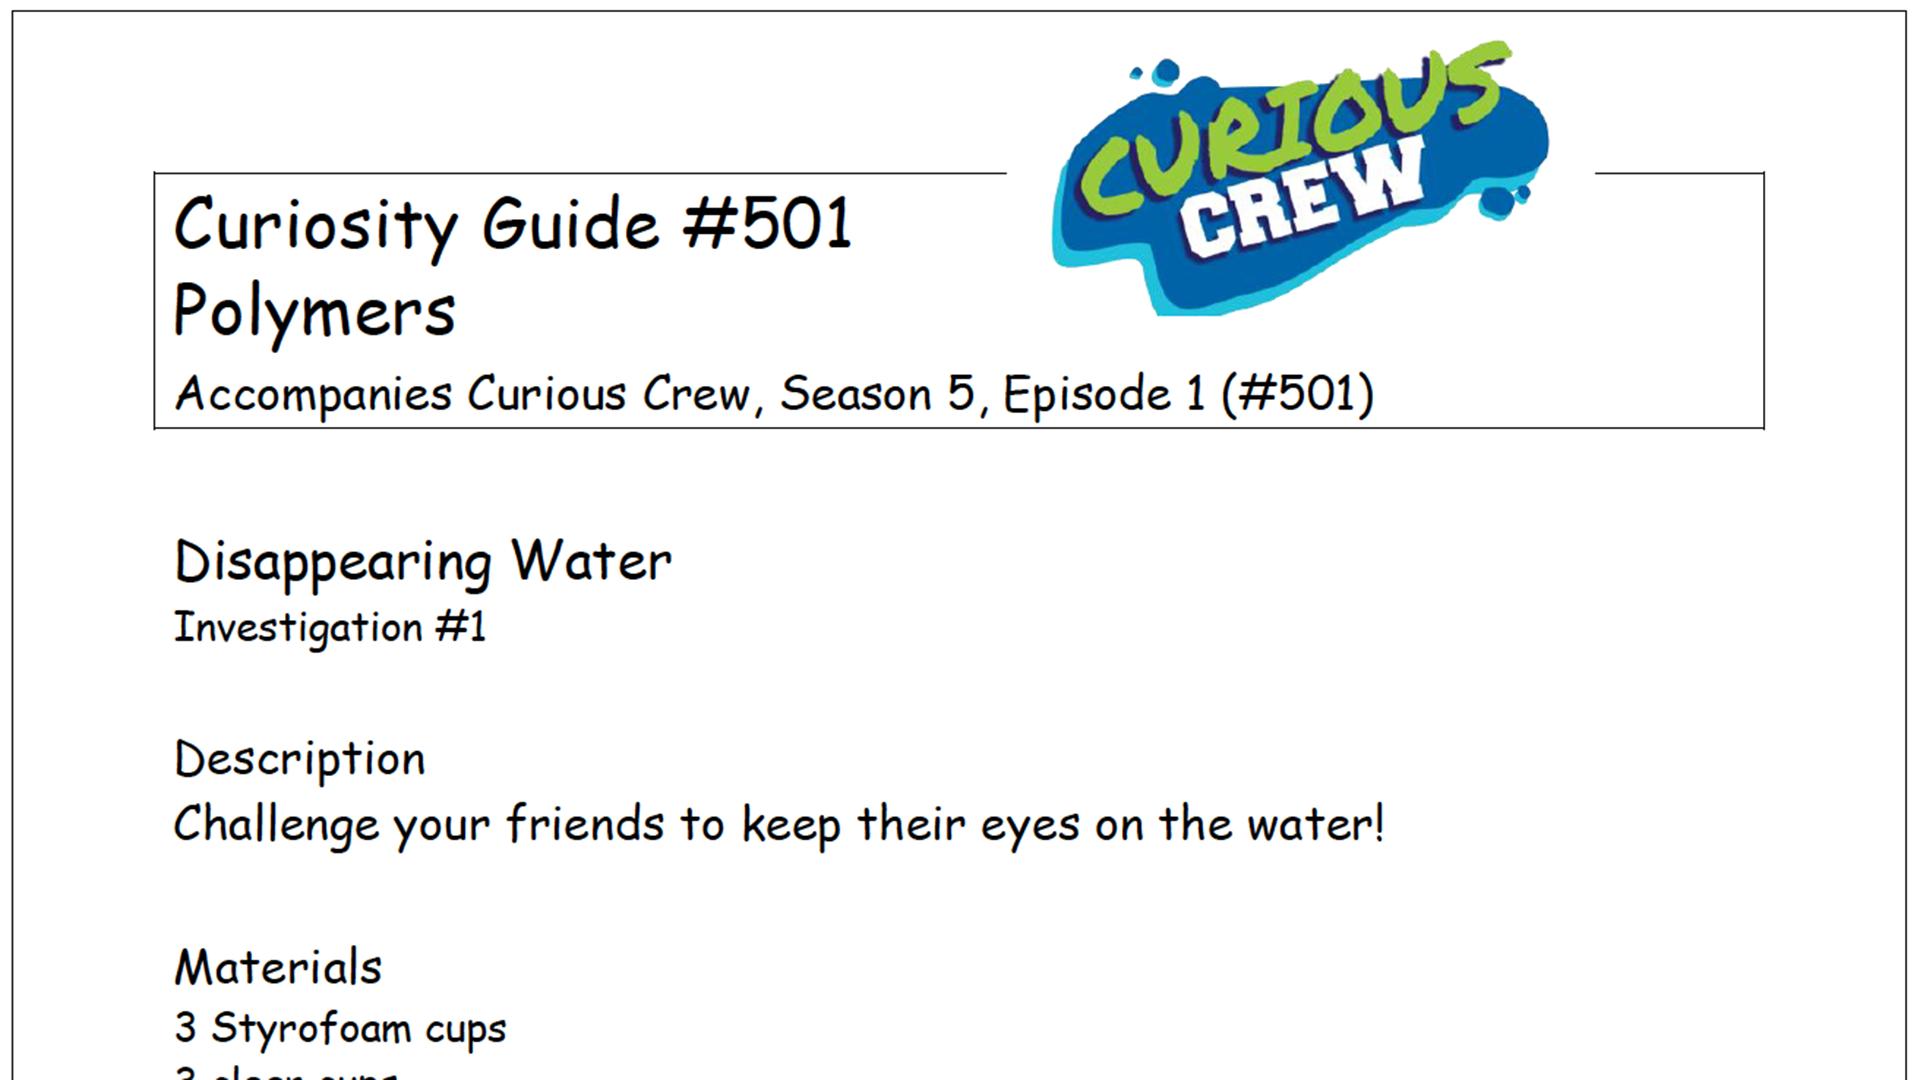 Curiosity Guide #501